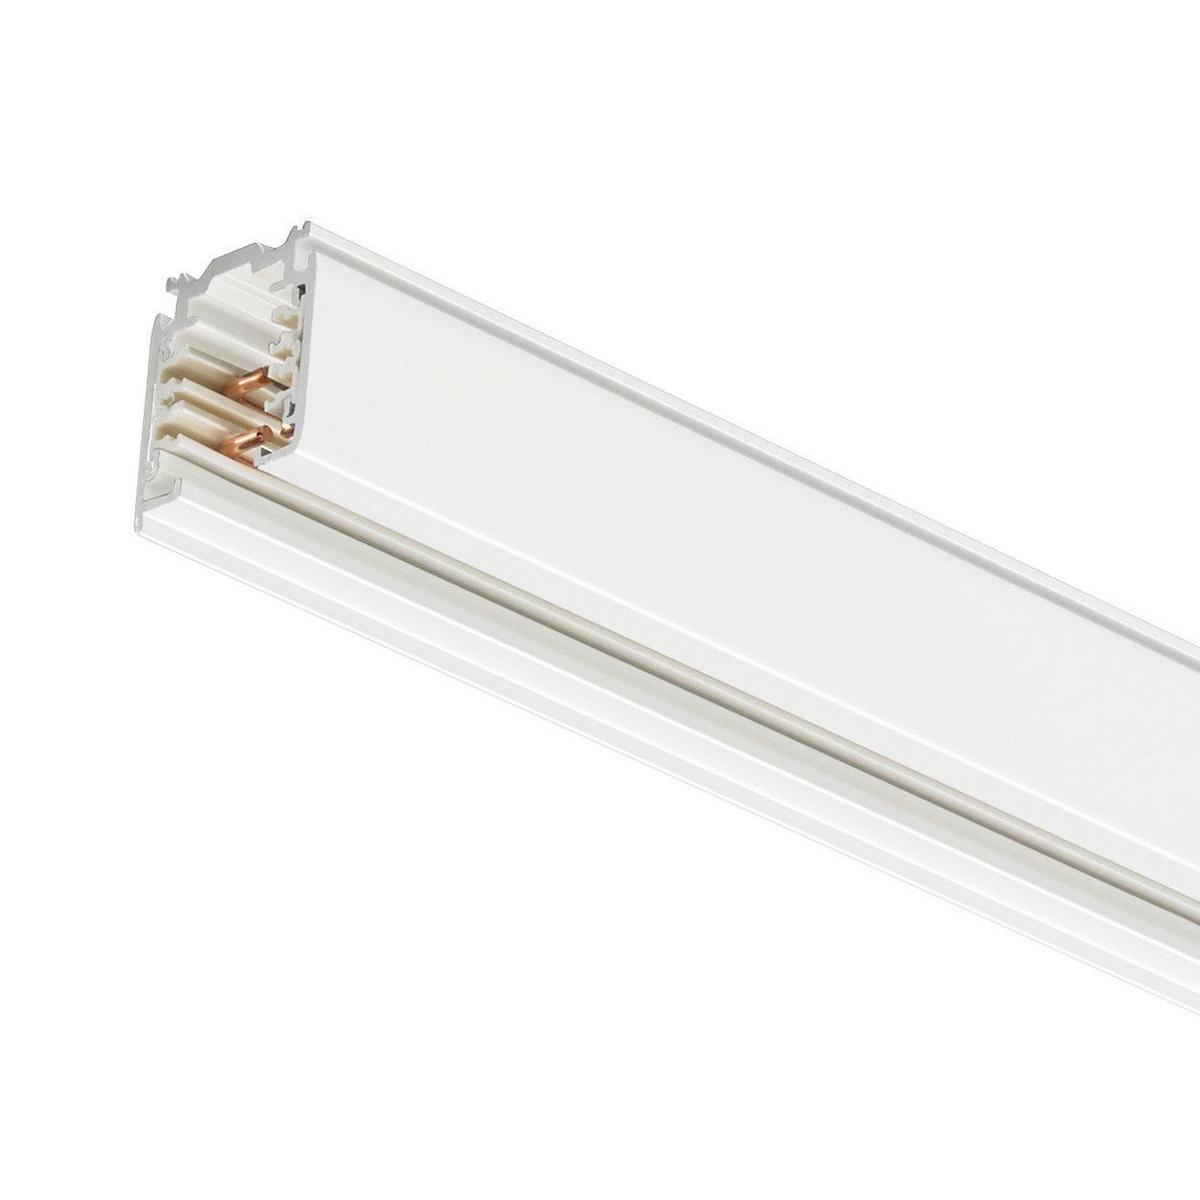 GLOBAL XTSC6300-3 Strømskinne DALI 3M Hvid